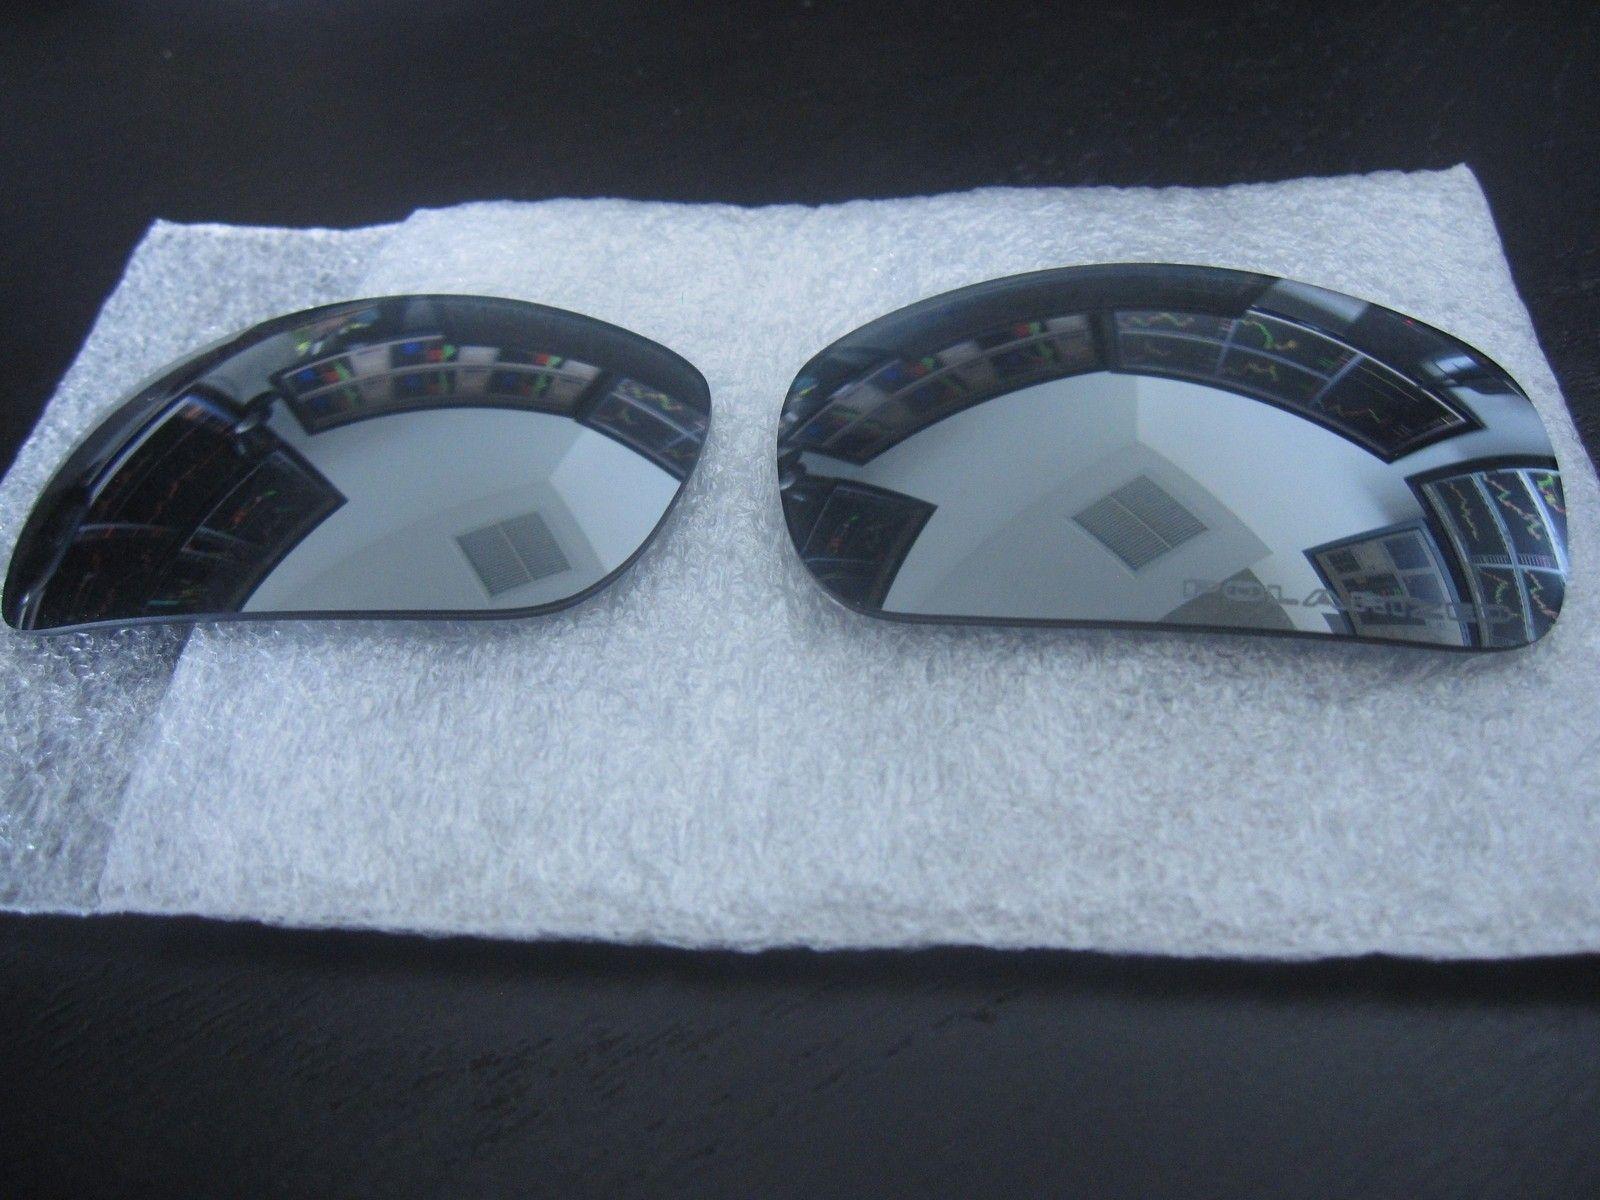 X-Squared Black iridium Polarized OEM lenses -not cut- BRAND NEW - IMG_2270.JPG